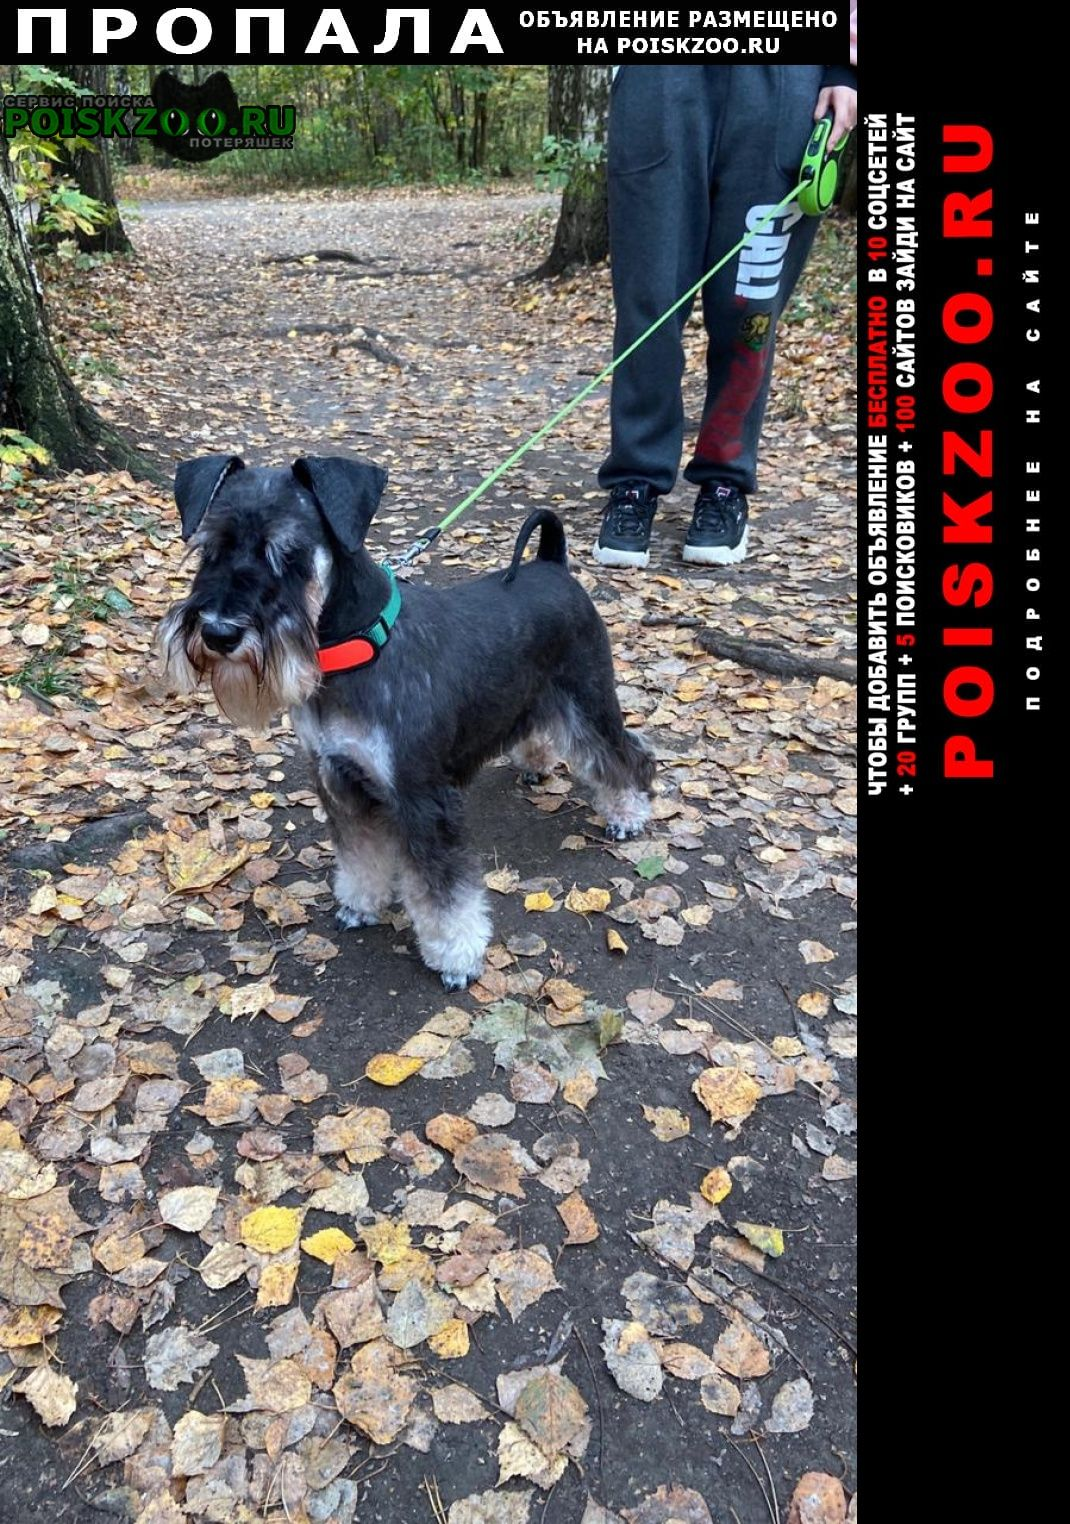 Пропала собака кобель в районе бибирево Москва